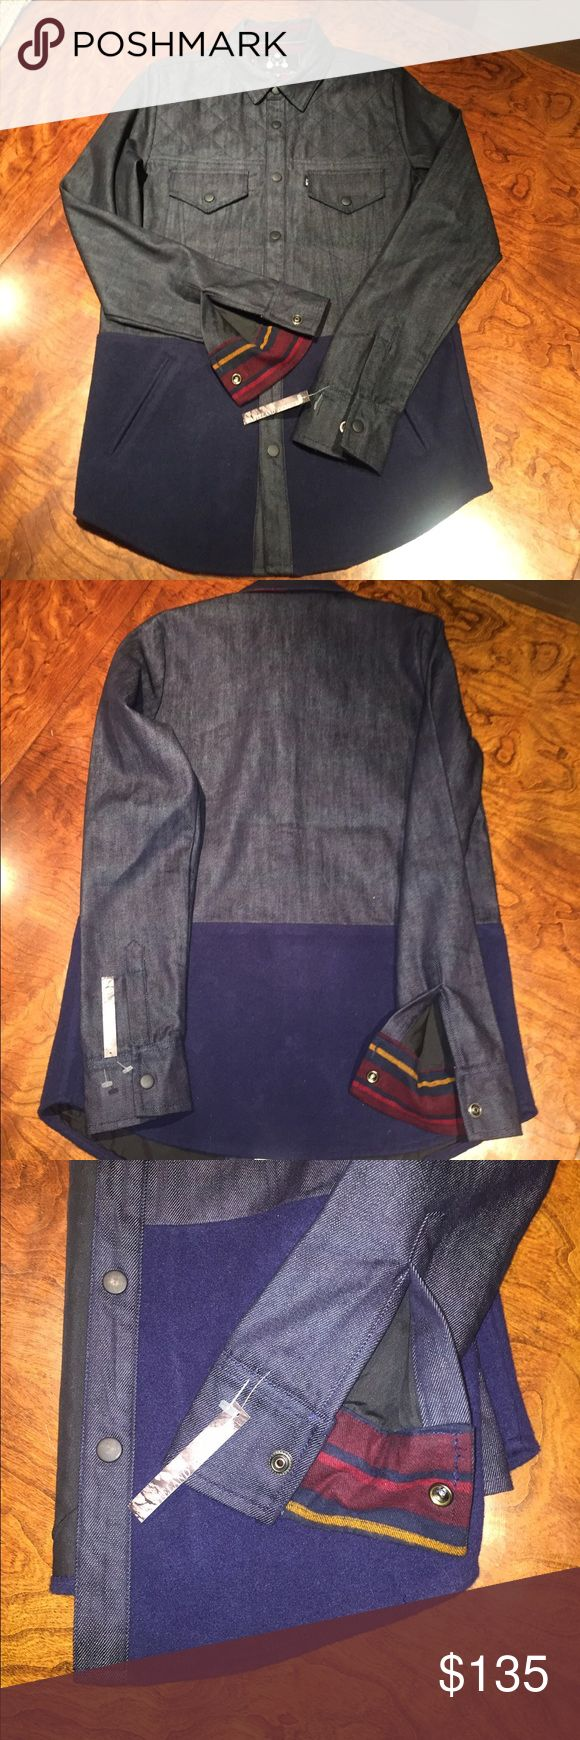 ZAK LOS ANGELES DENIM JACKET😎😎😎 Beautiful ZAK LOS ANGELES Denim Jacket! Fully lined Jacket a Hipster's favorite designer of Los Angeles. Yoke top front stitching. Snap pockets at chest. Bottom has two slit pockets Felt is navy blue. New never worn. Bought at Wasteland on Melrose. ZAK Jackets & Coats